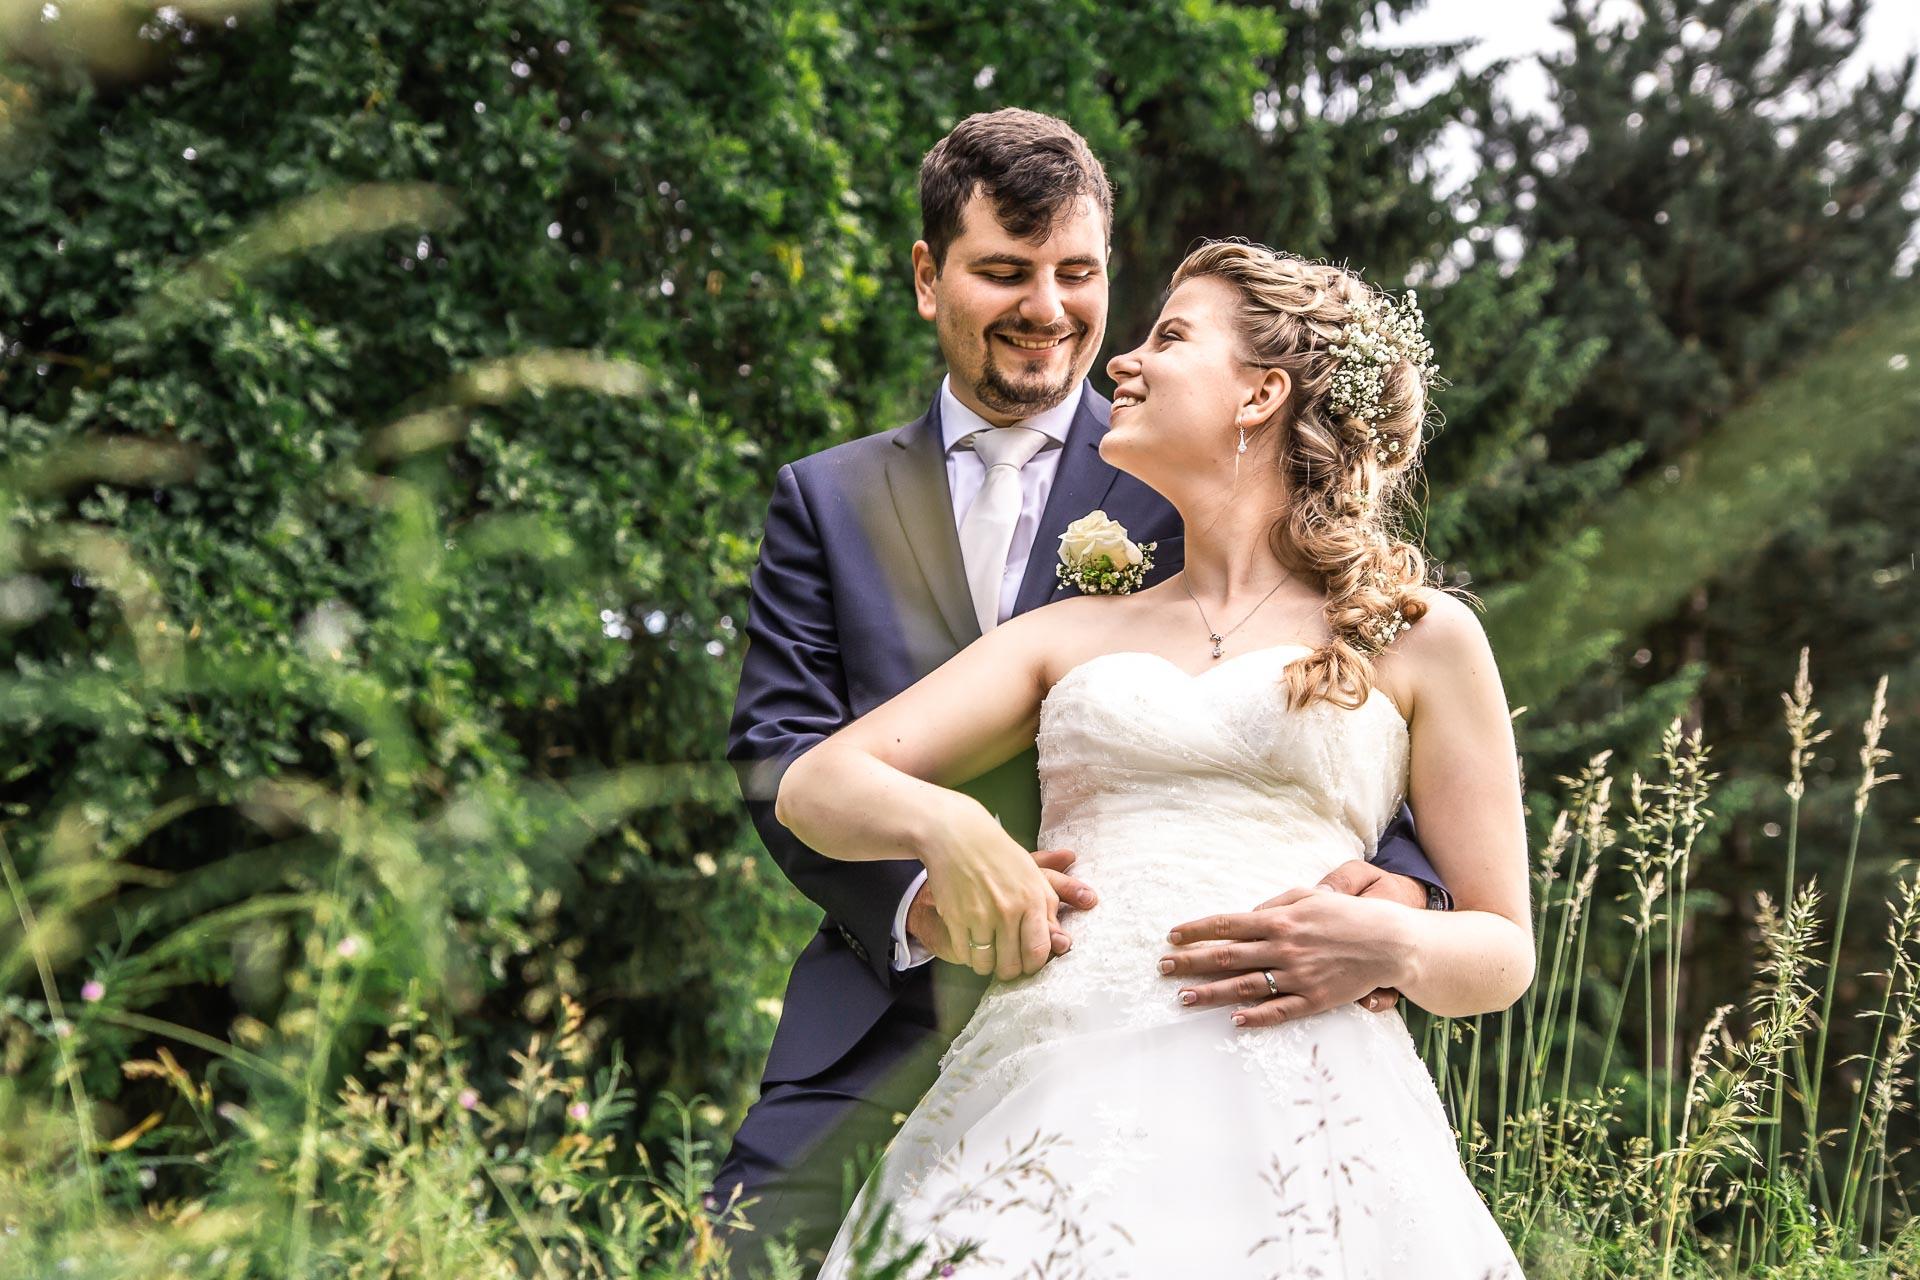 Svatební-fotograf-Nymburk-6111